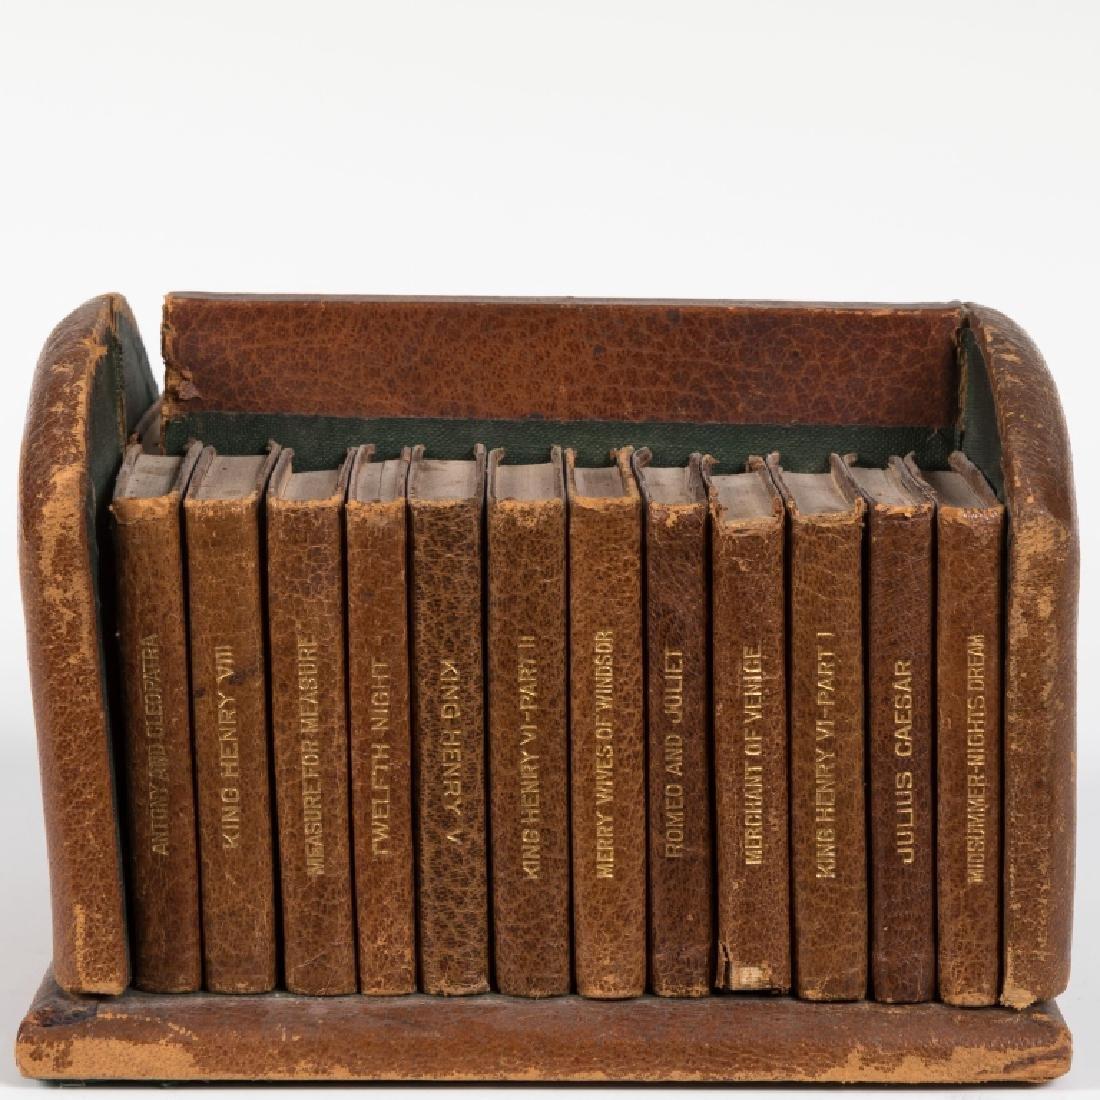 Shakespeare Miniature Set Leather Books - 24 Vol - 3